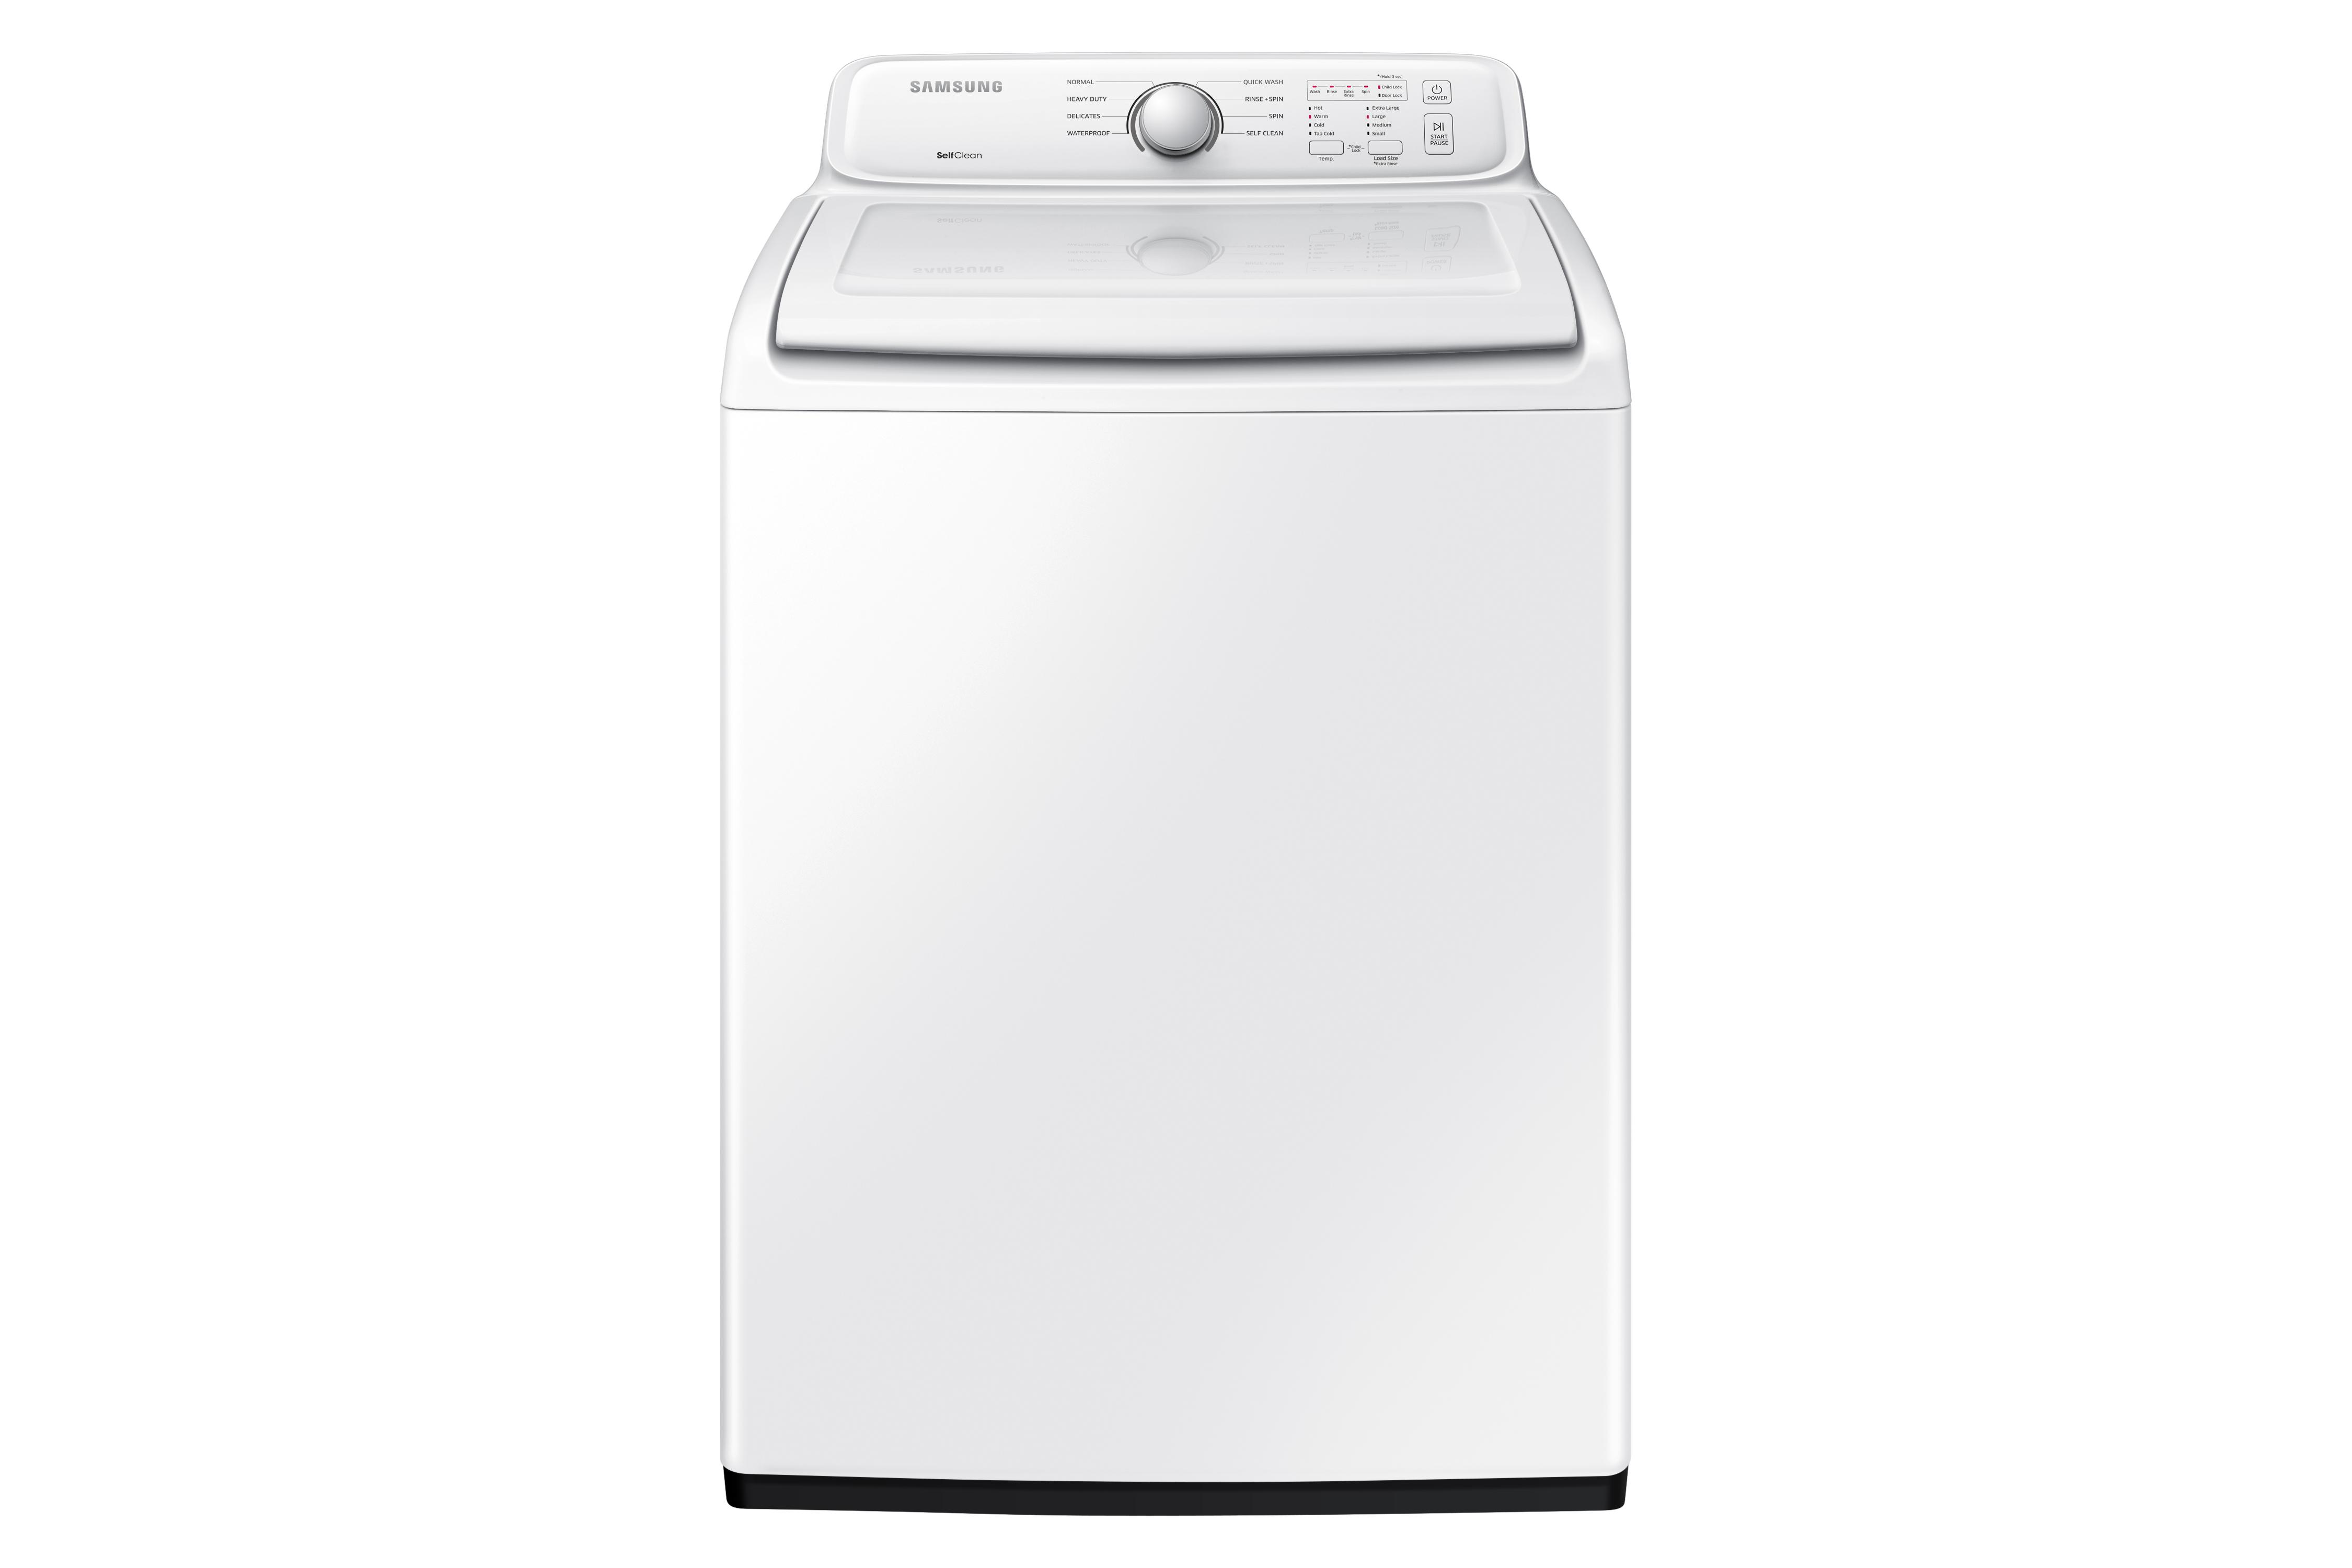 Samsung 4.0 cu. ft. High Efficency Top-Load Washer WA40J3000AW